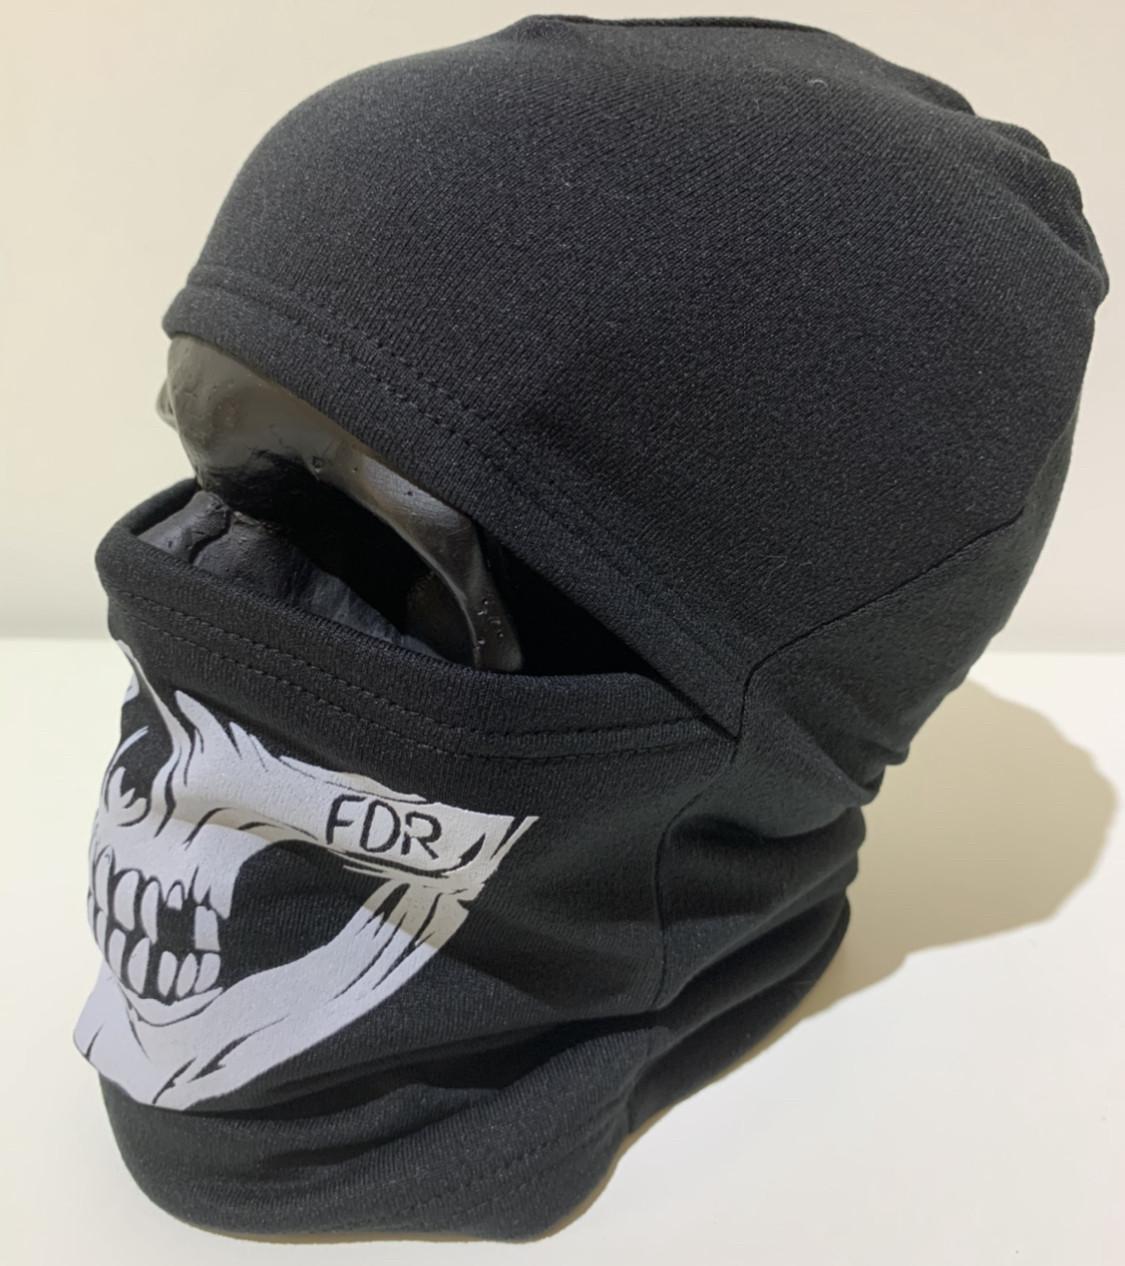 Балаклава череп (Skull) FDR черная